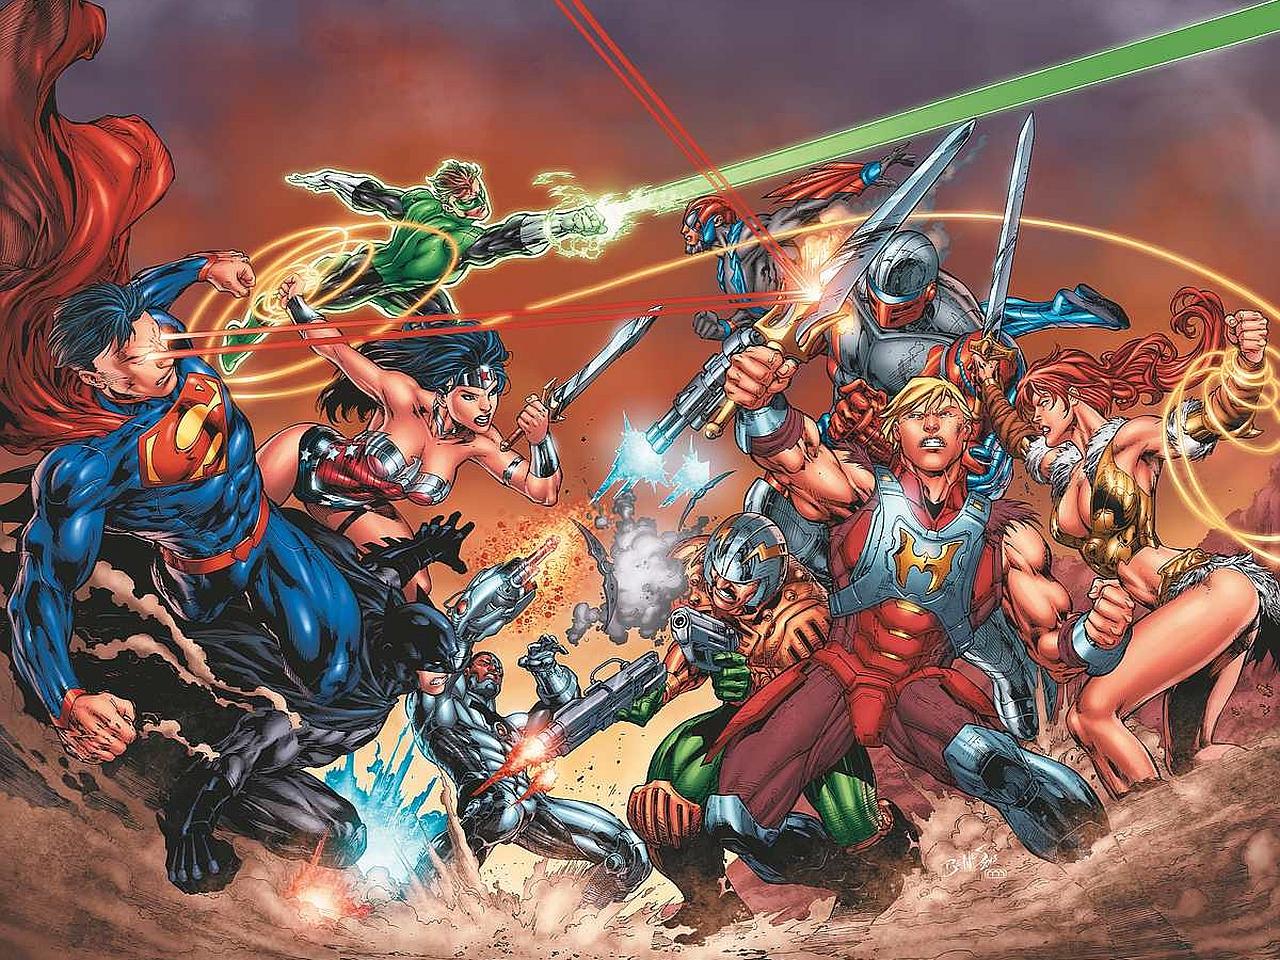 Free Download Comics Dc Universe Vs The Master Of The Universe